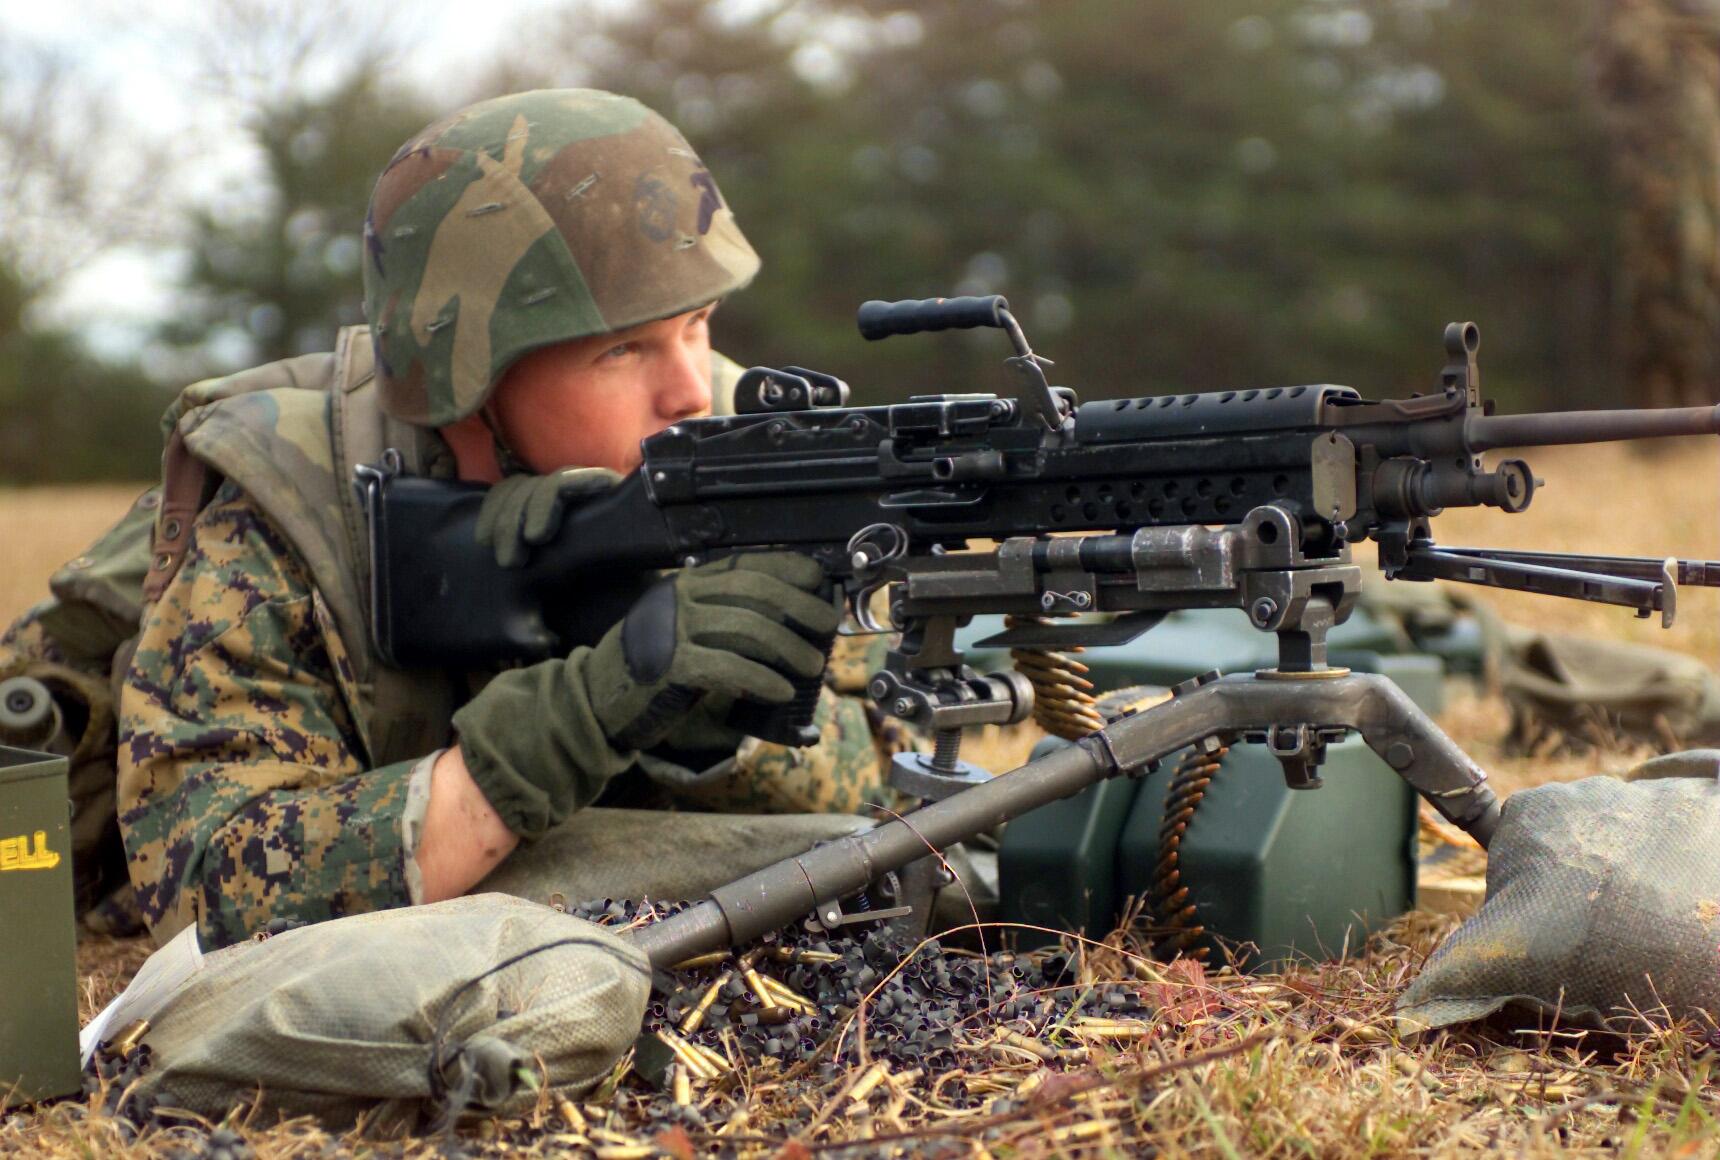 M249_FN_MINIMI_DM-SD-05-05342.jpg